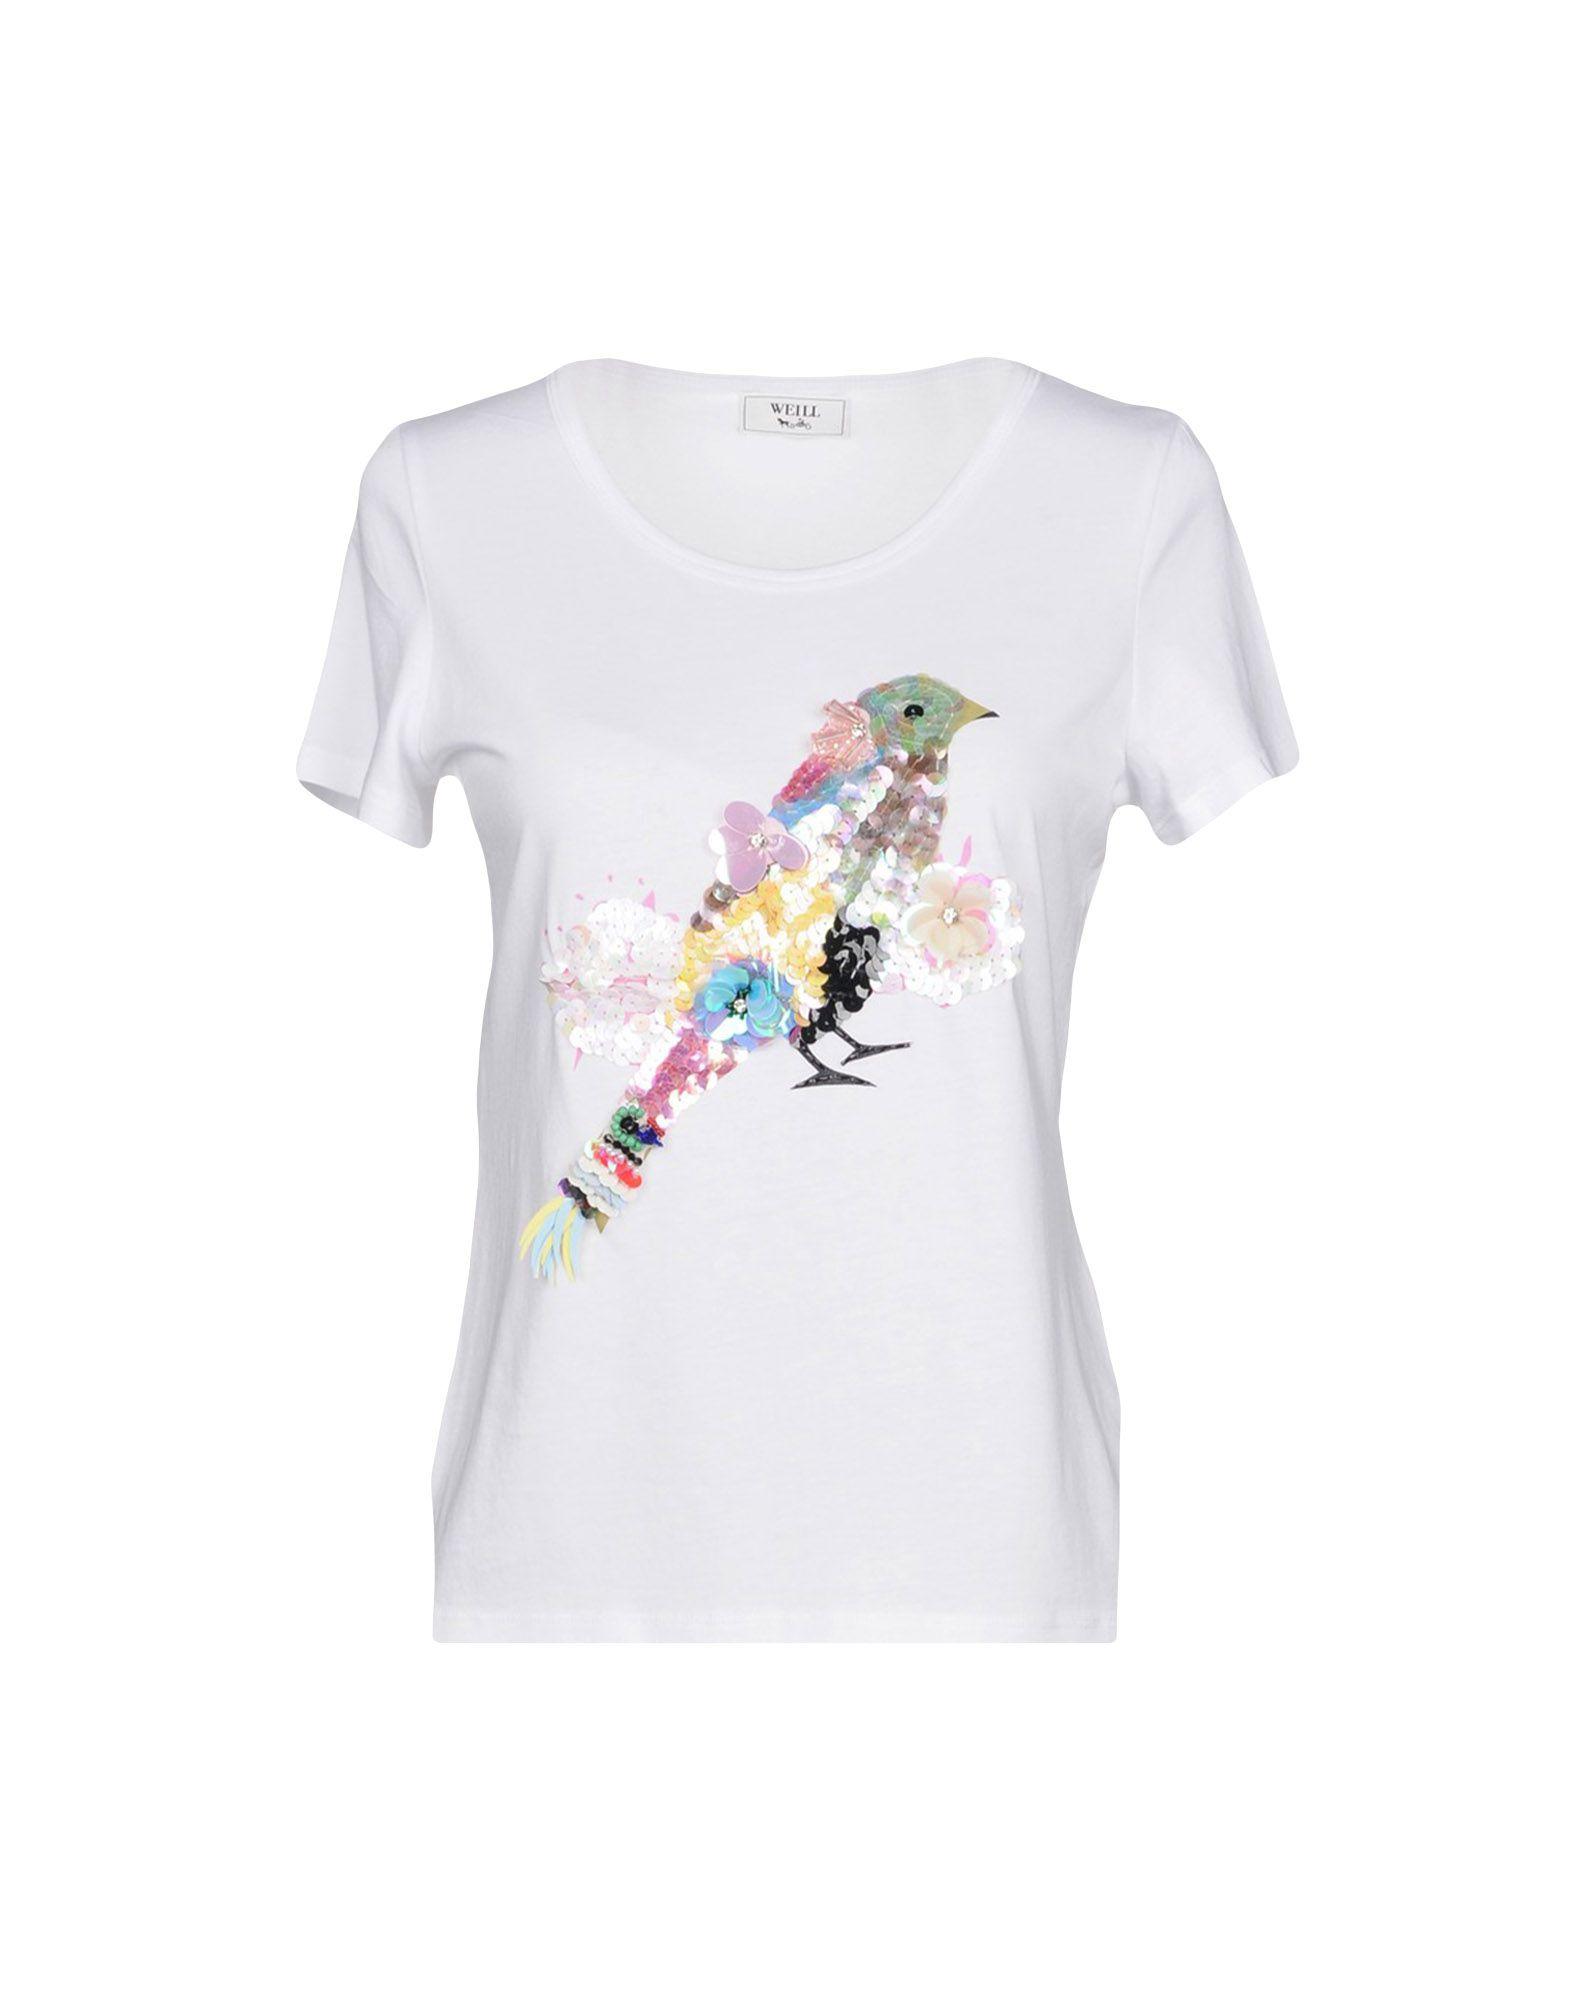 WEILL T-Shirt in White